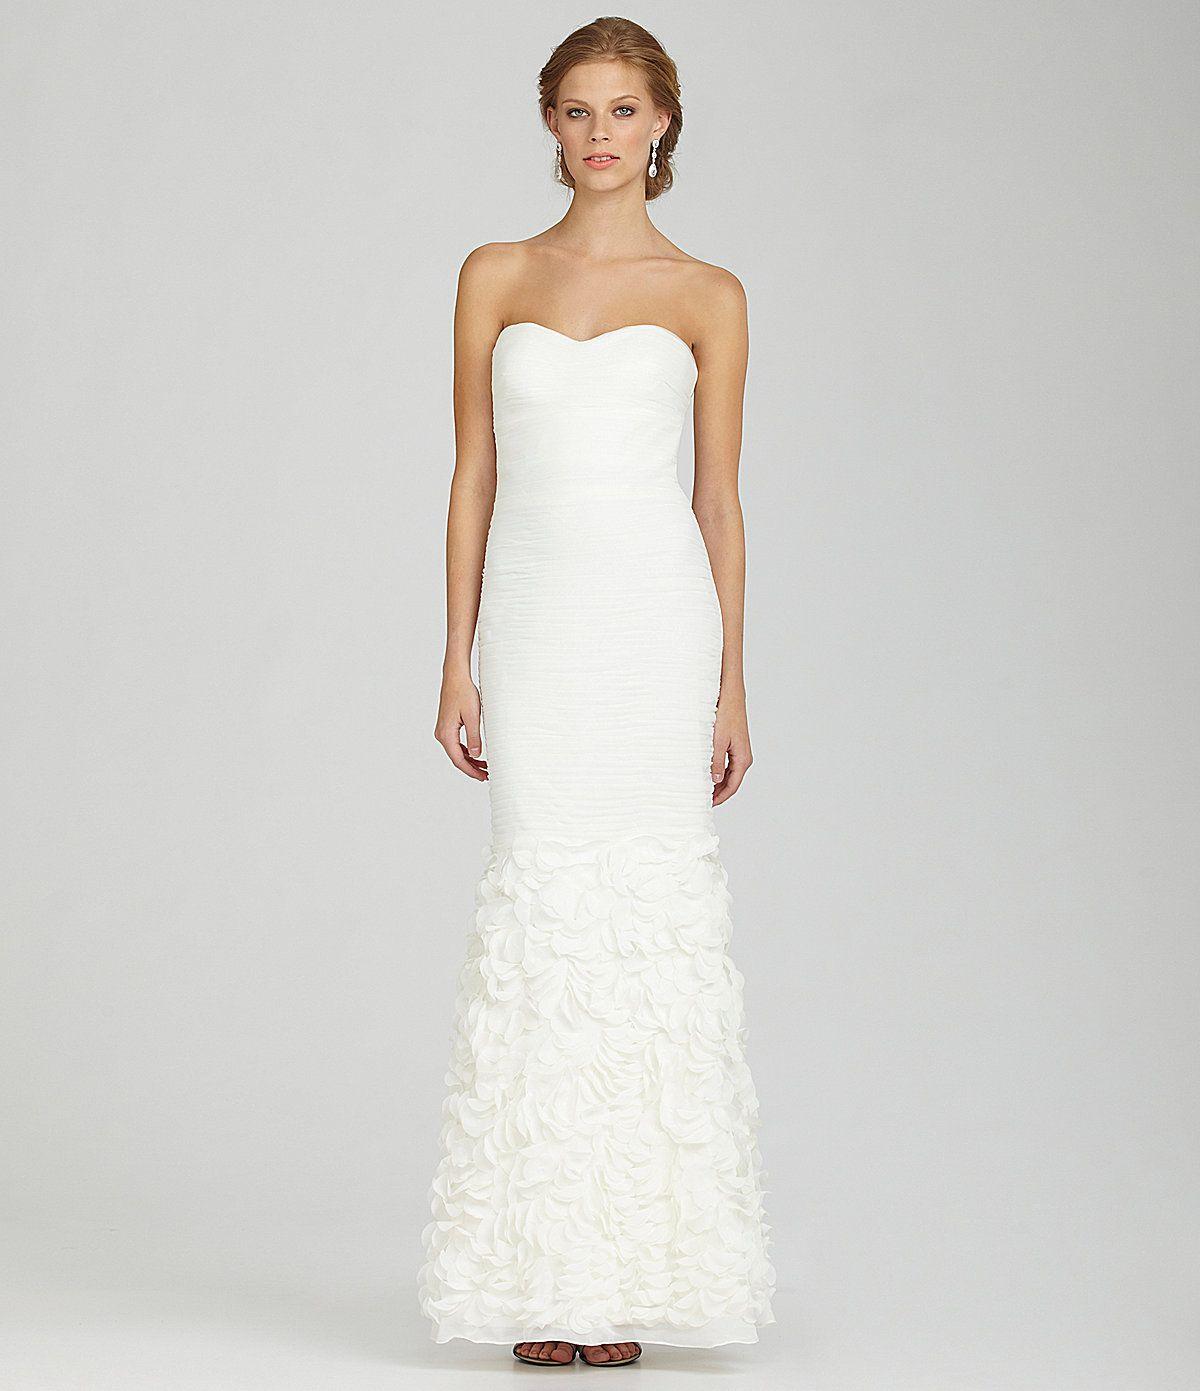 c2cde9d35977 Js Collections Wedding Dresses - Wedding Dress & Decore Ideas